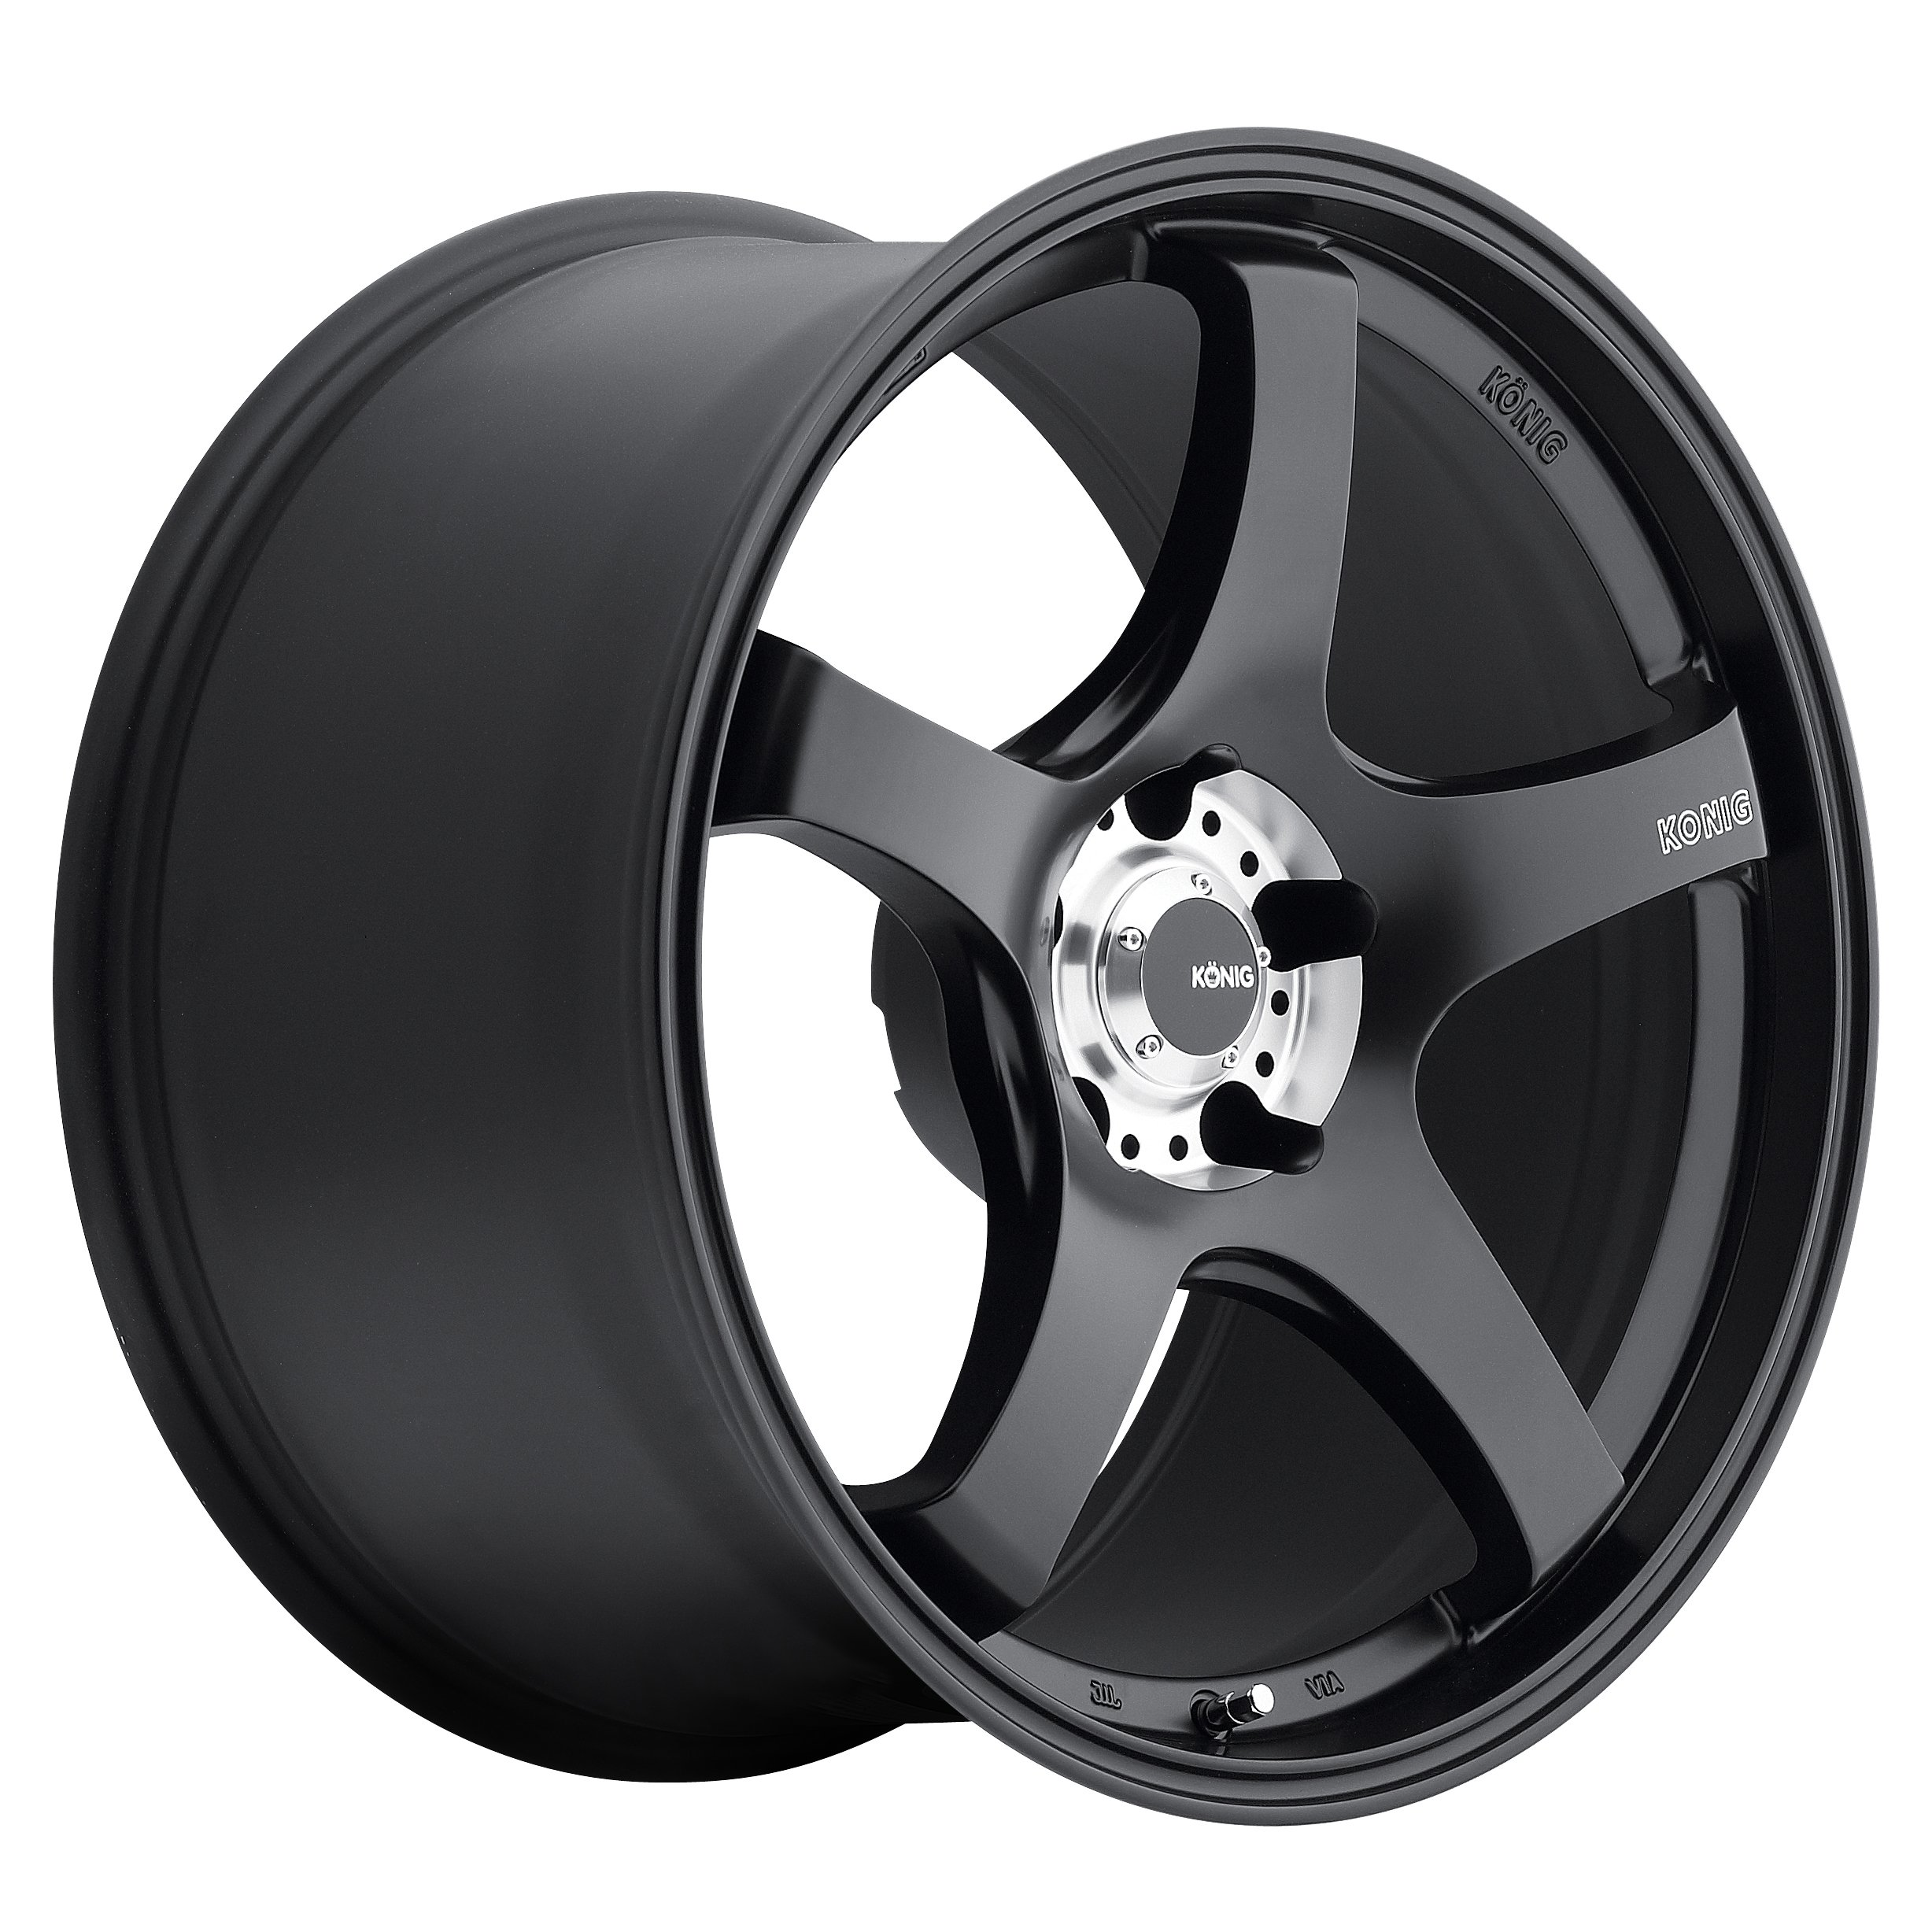 Konig CENTIGRAM Matte Black Wheel with Machined PCD (19x8.5''/5x114.3mm, +33mm offset) by Konig (Image #1)